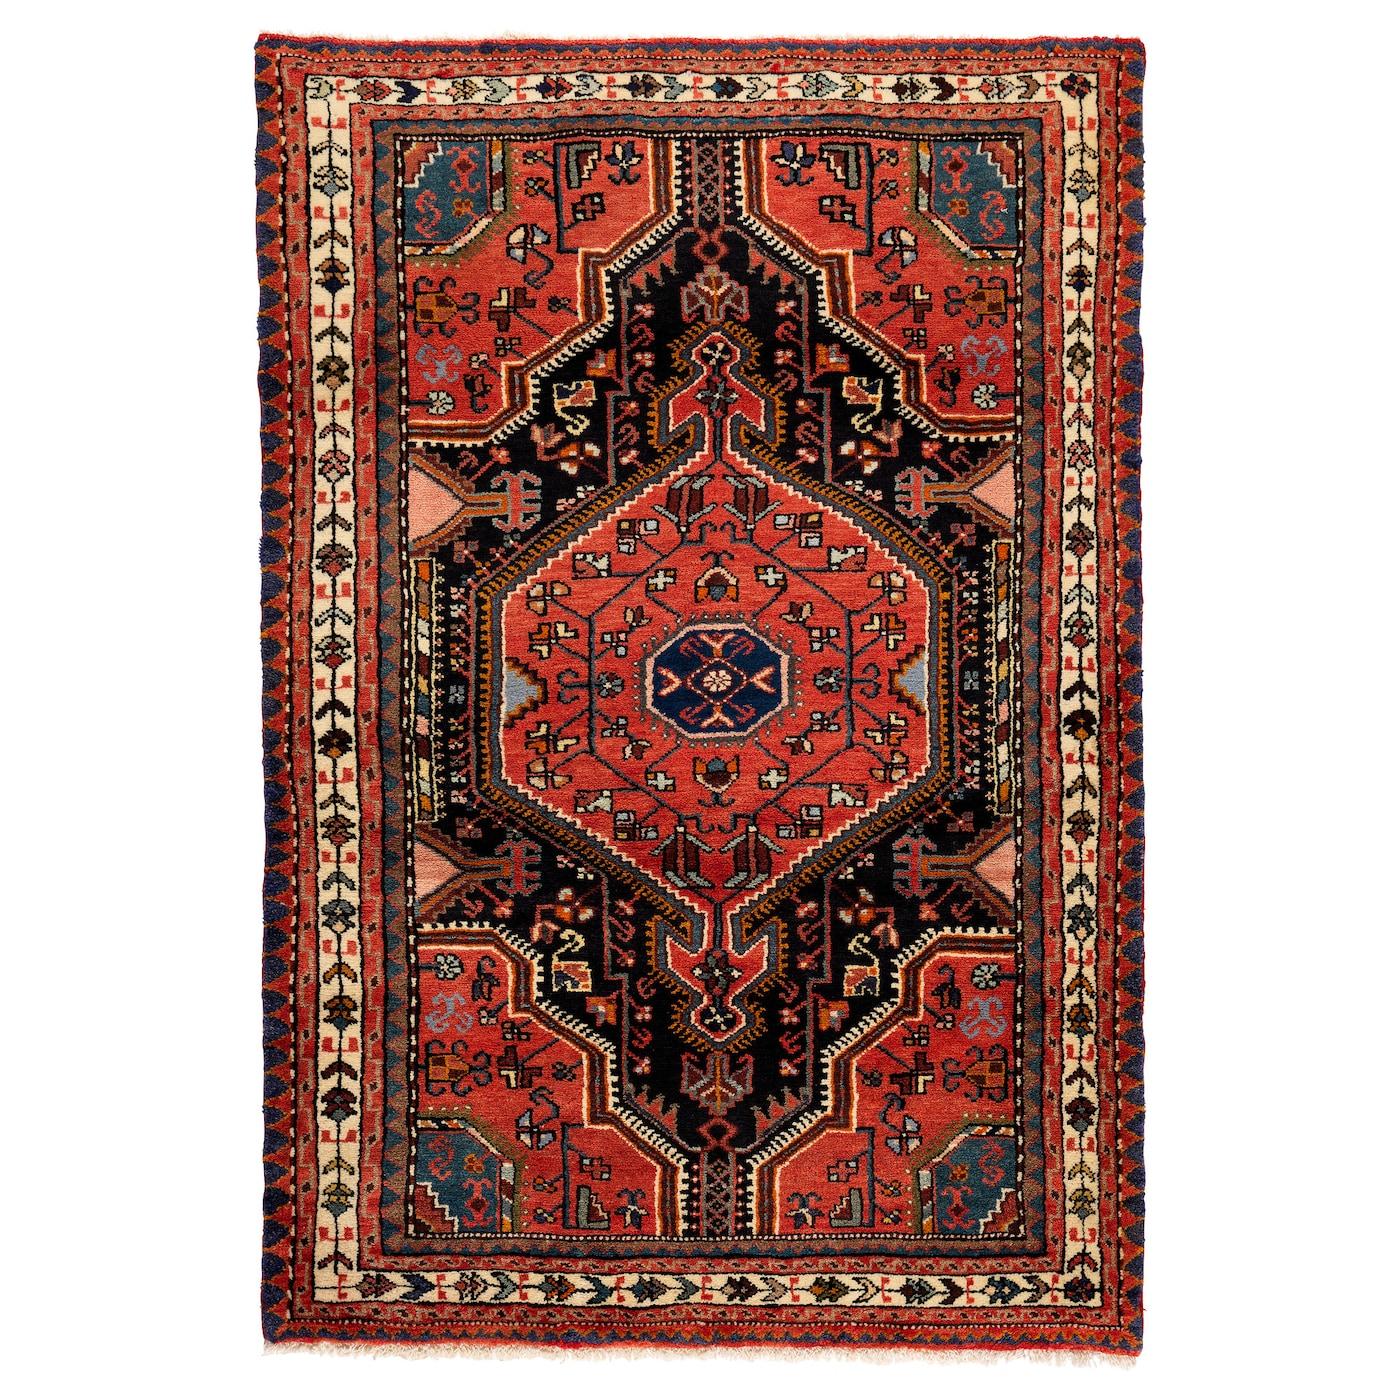 oriental persian rugs ikea ireland dublin. Black Bedroom Furniture Sets. Home Design Ideas